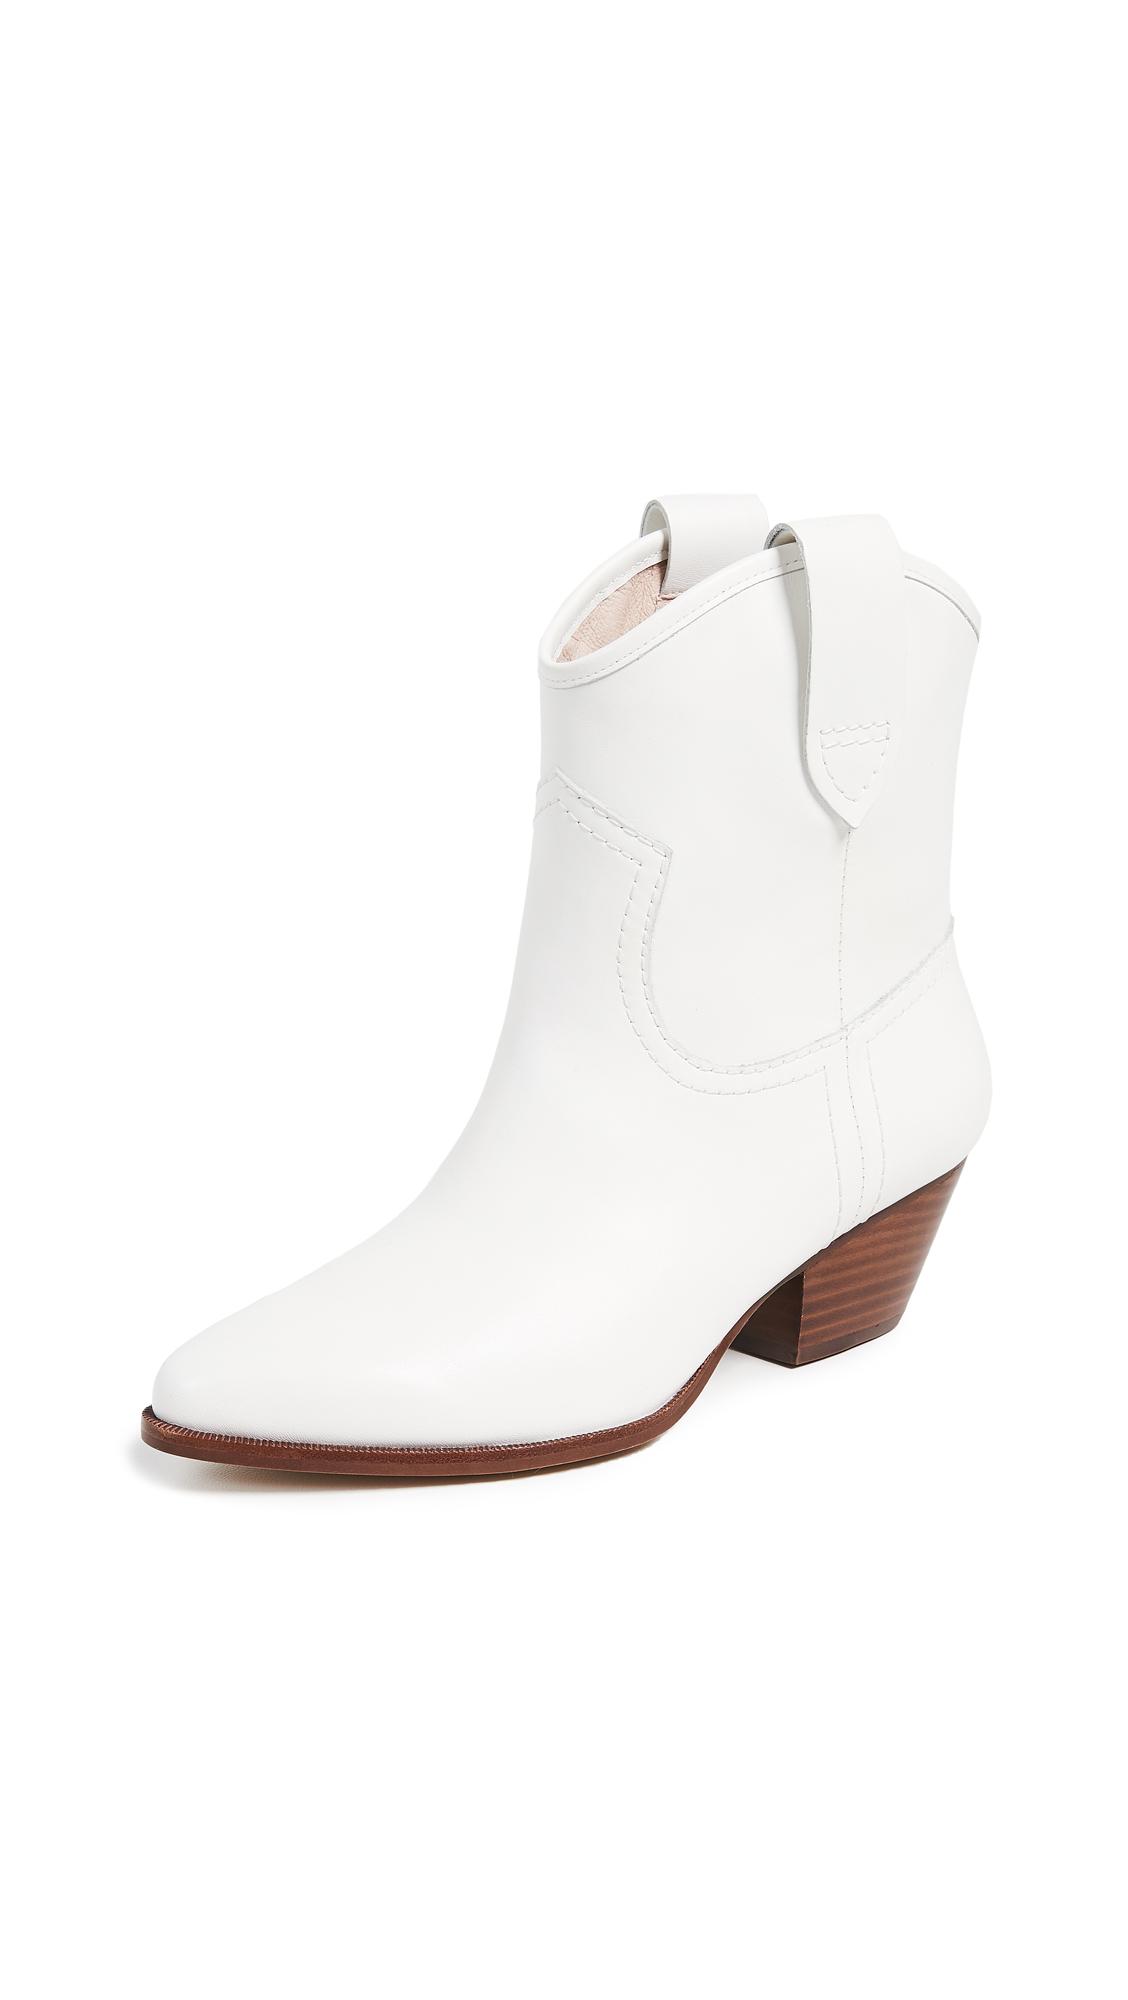 Rachel Zoe Cameron Western Boots - White